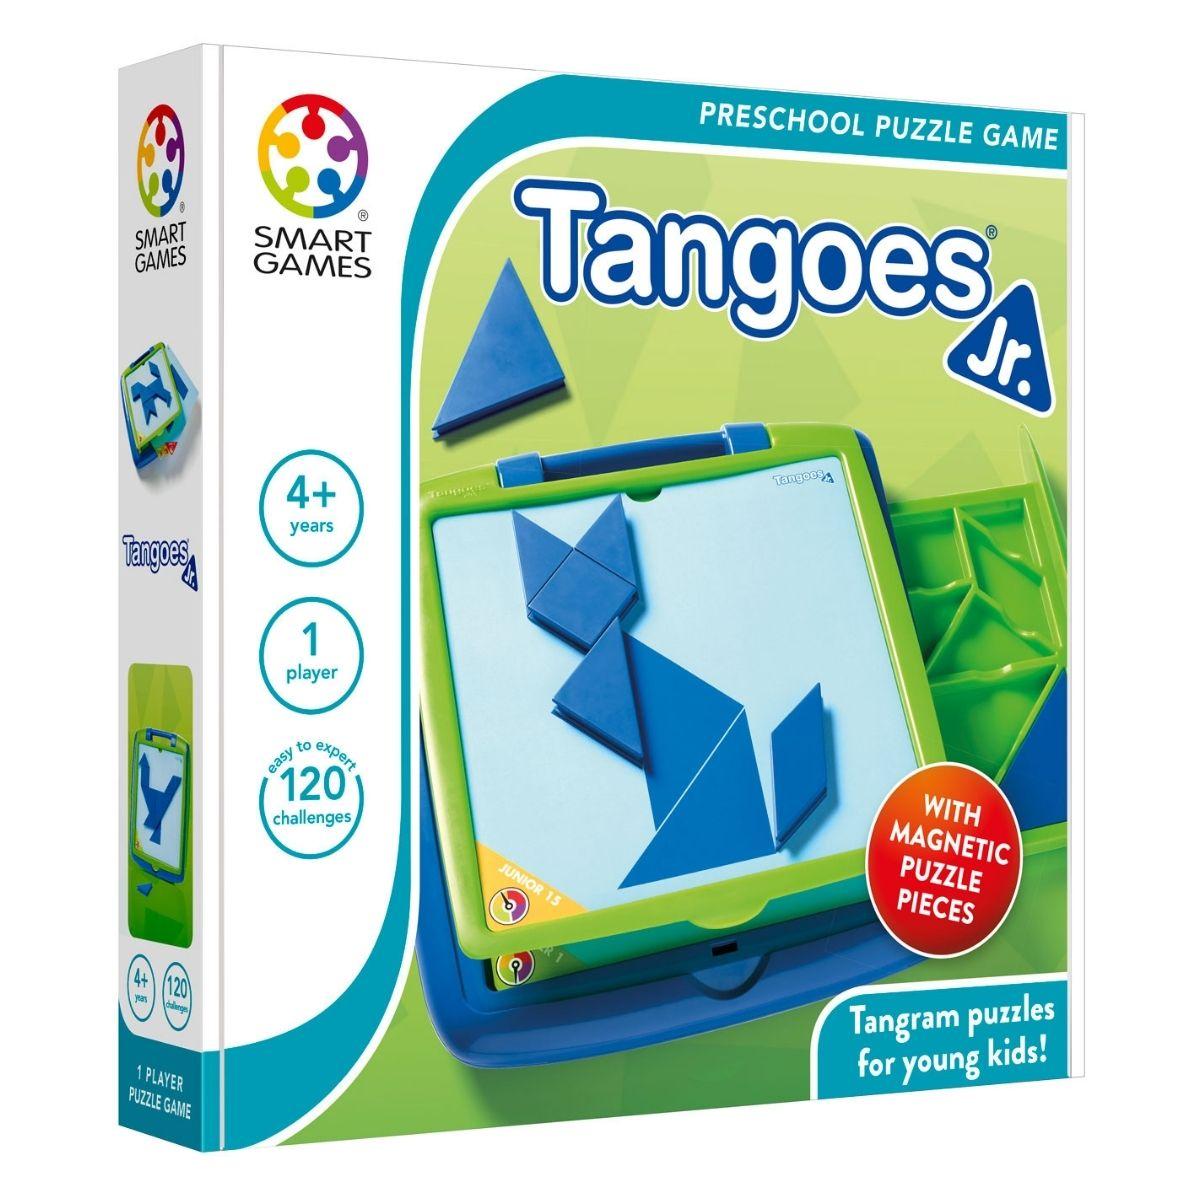 Brinquedo Educativo LúdicoTangoes Jr